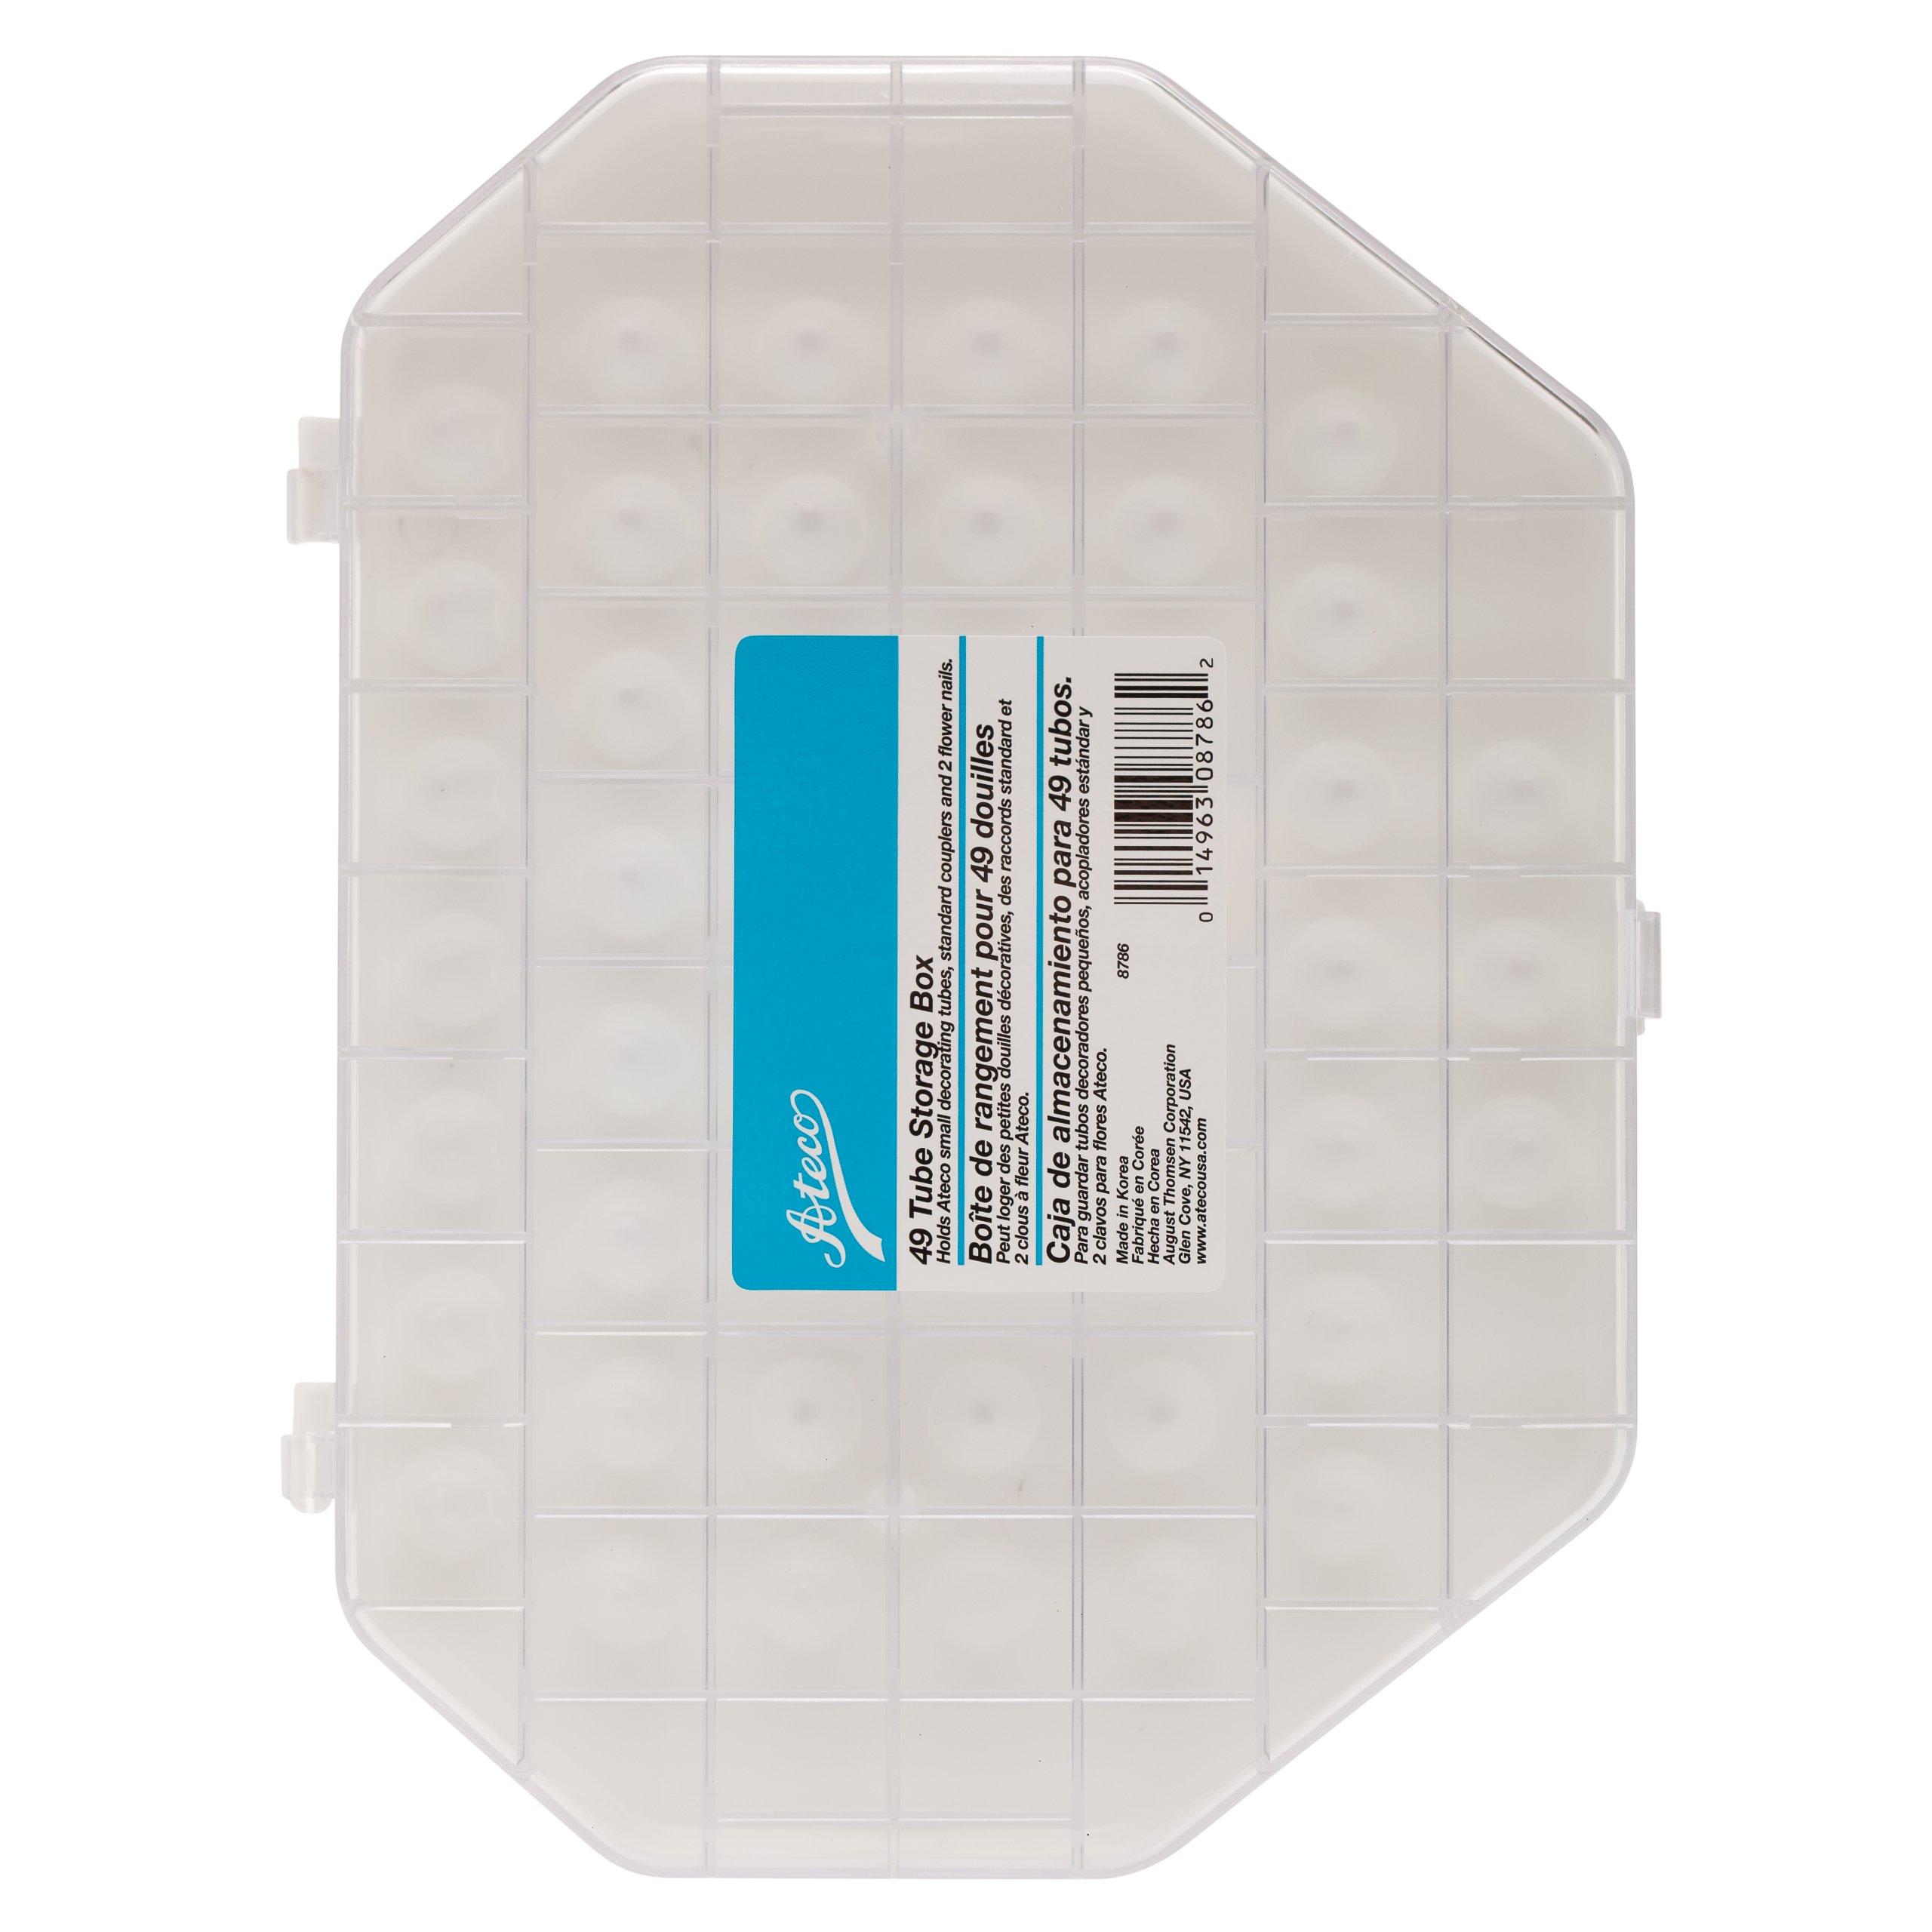 Ateco 8786 Tube Storage Box, 49-Compartments for Small & Medium Decorating Tubes